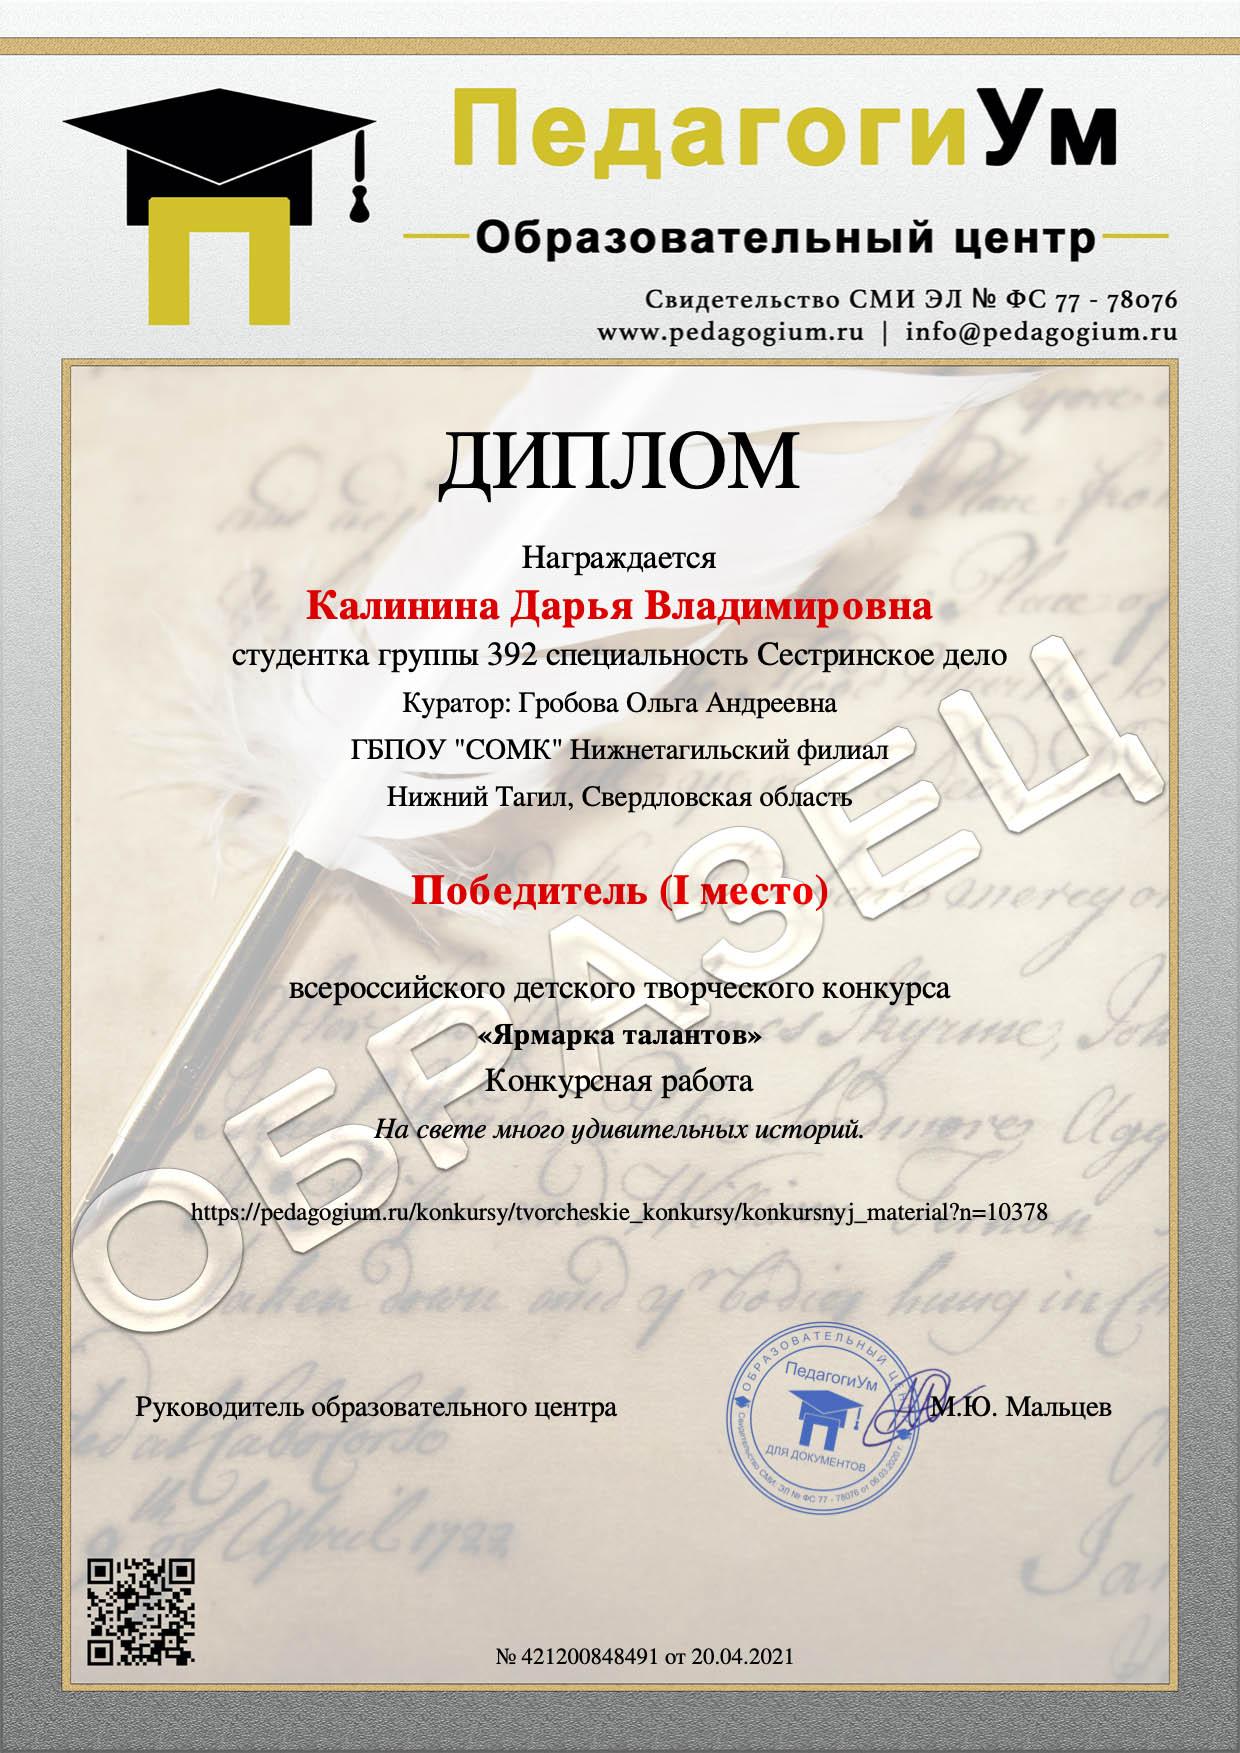 Образец документа воспитаннику-участнику детского творческого конкурса центра ПедагогиУм.